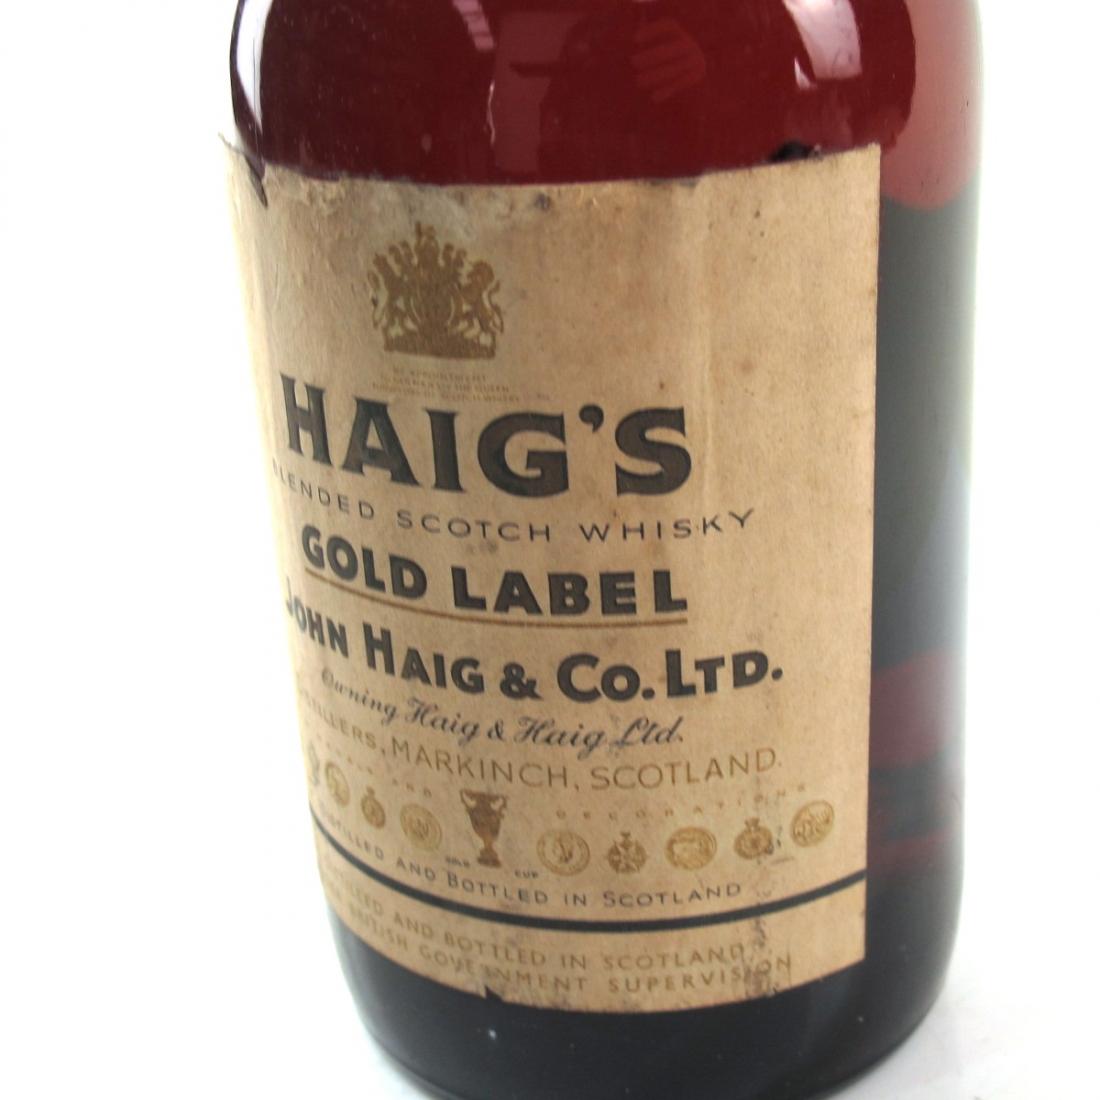 Haig's Gold Label Circa 1950/1960s